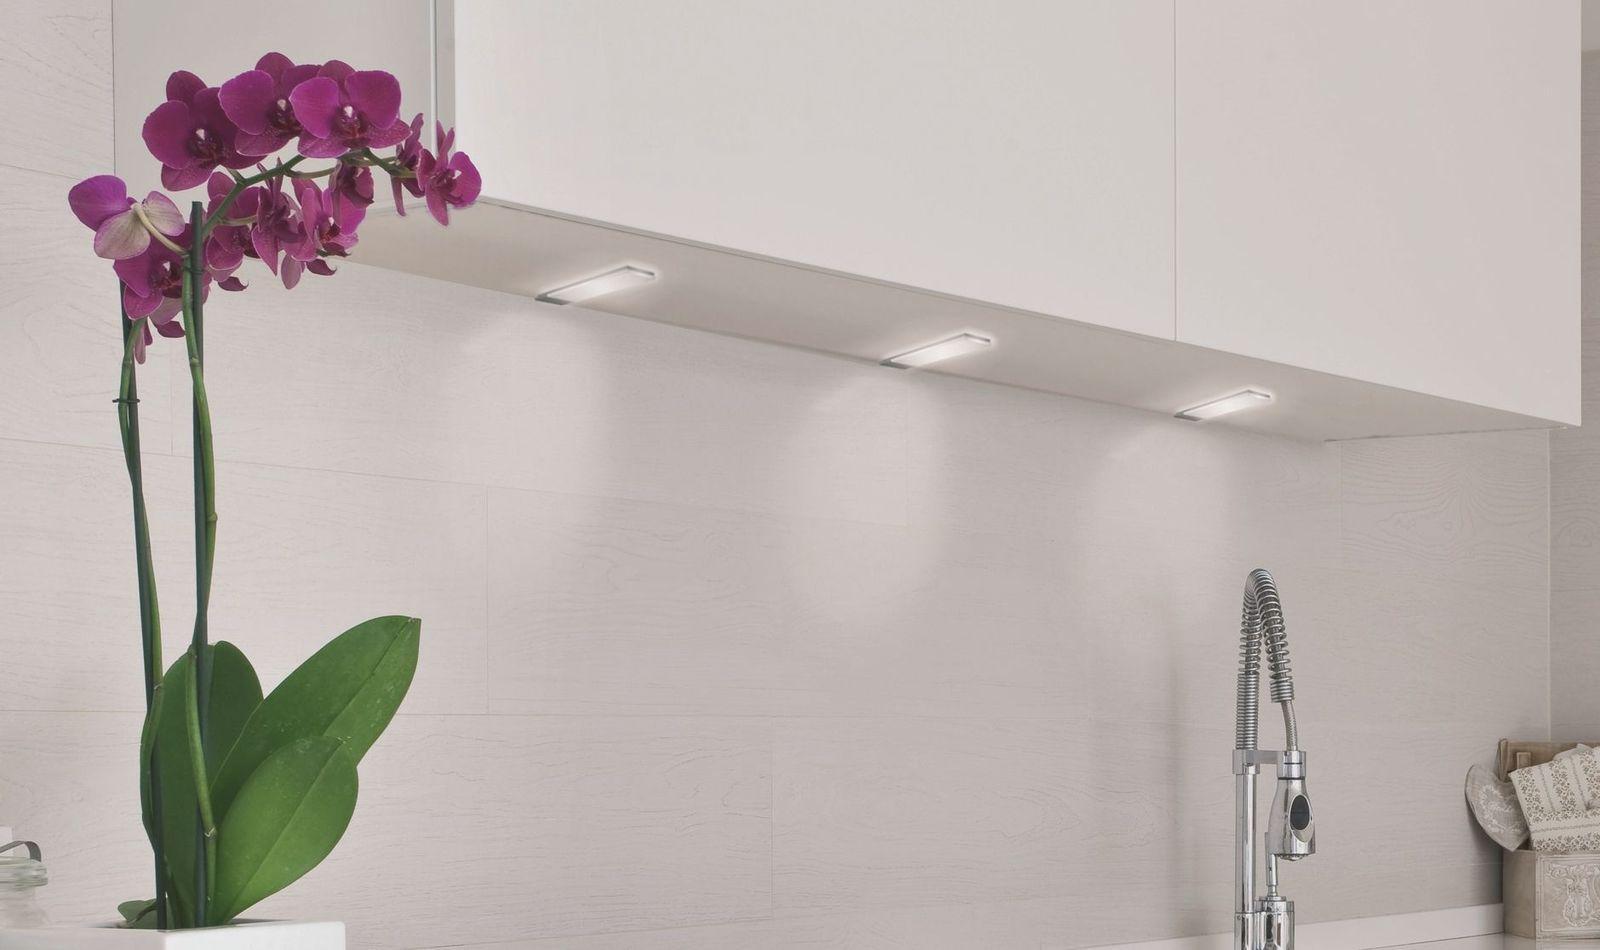 kchenlampe led trendy deckenlampe wandlampe kchenlampe neu design w dimmbar mit led deckenlampe. Black Bedroom Furniture Sets. Home Design Ideas